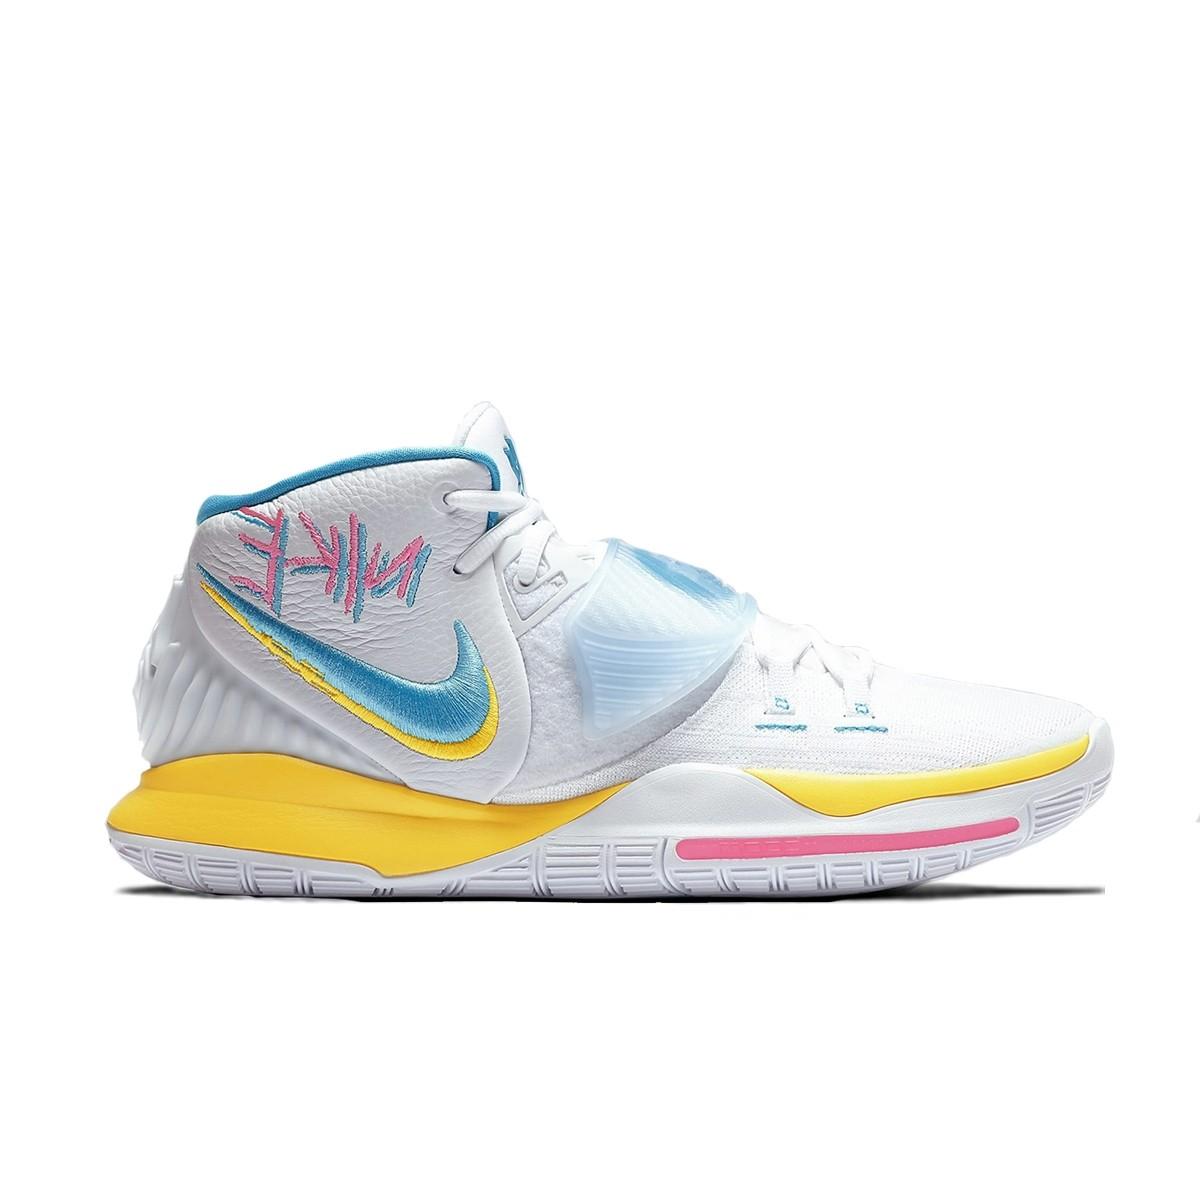 Nike Kyrie 6 'Neon Graffiti'